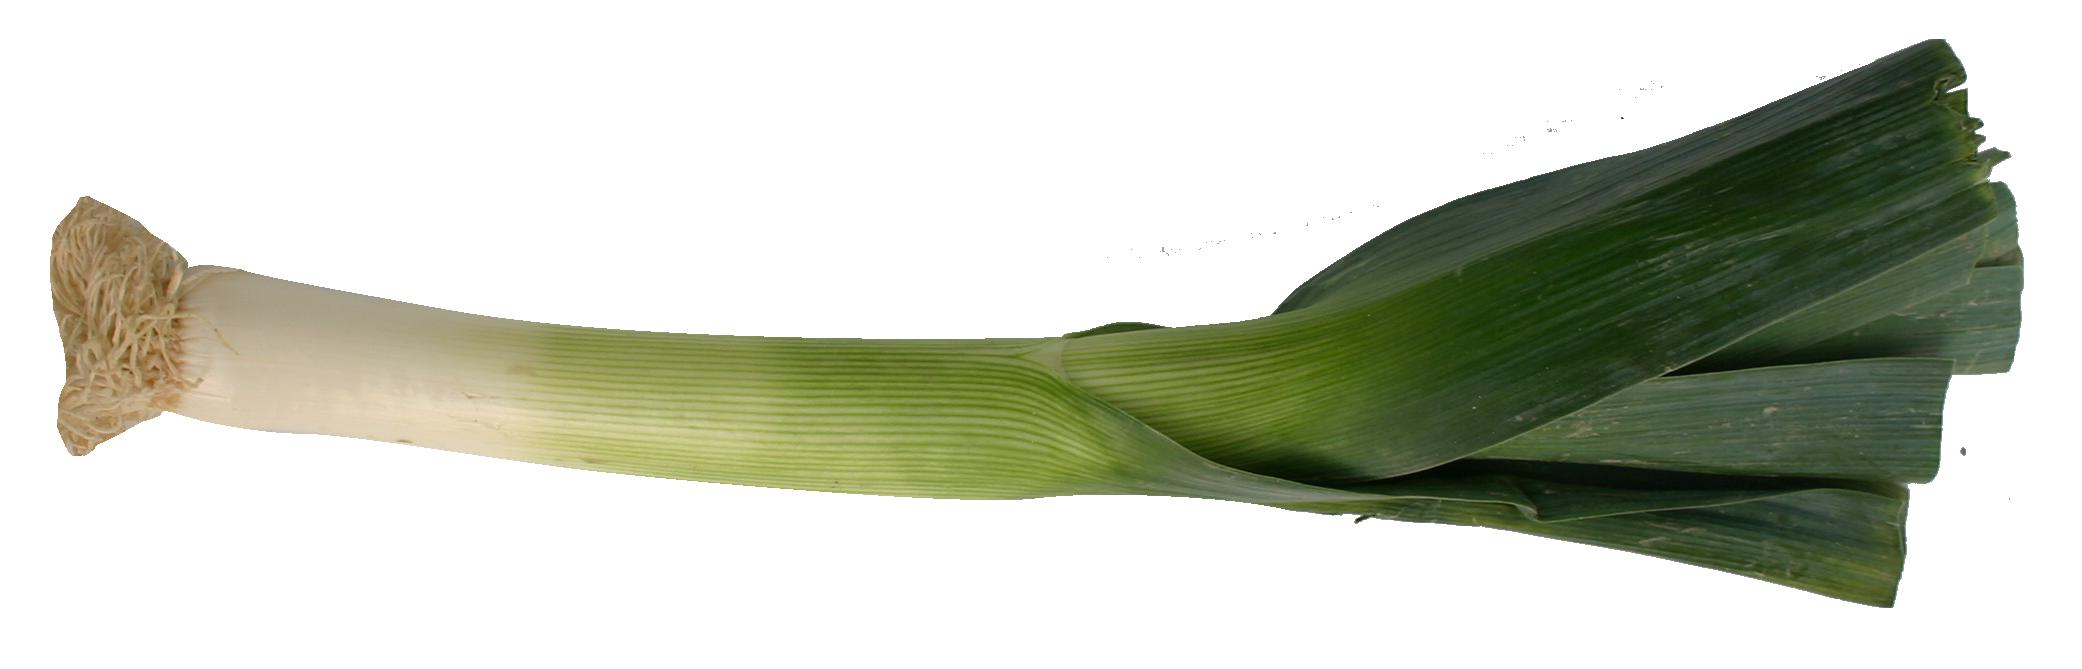 Leek PNG